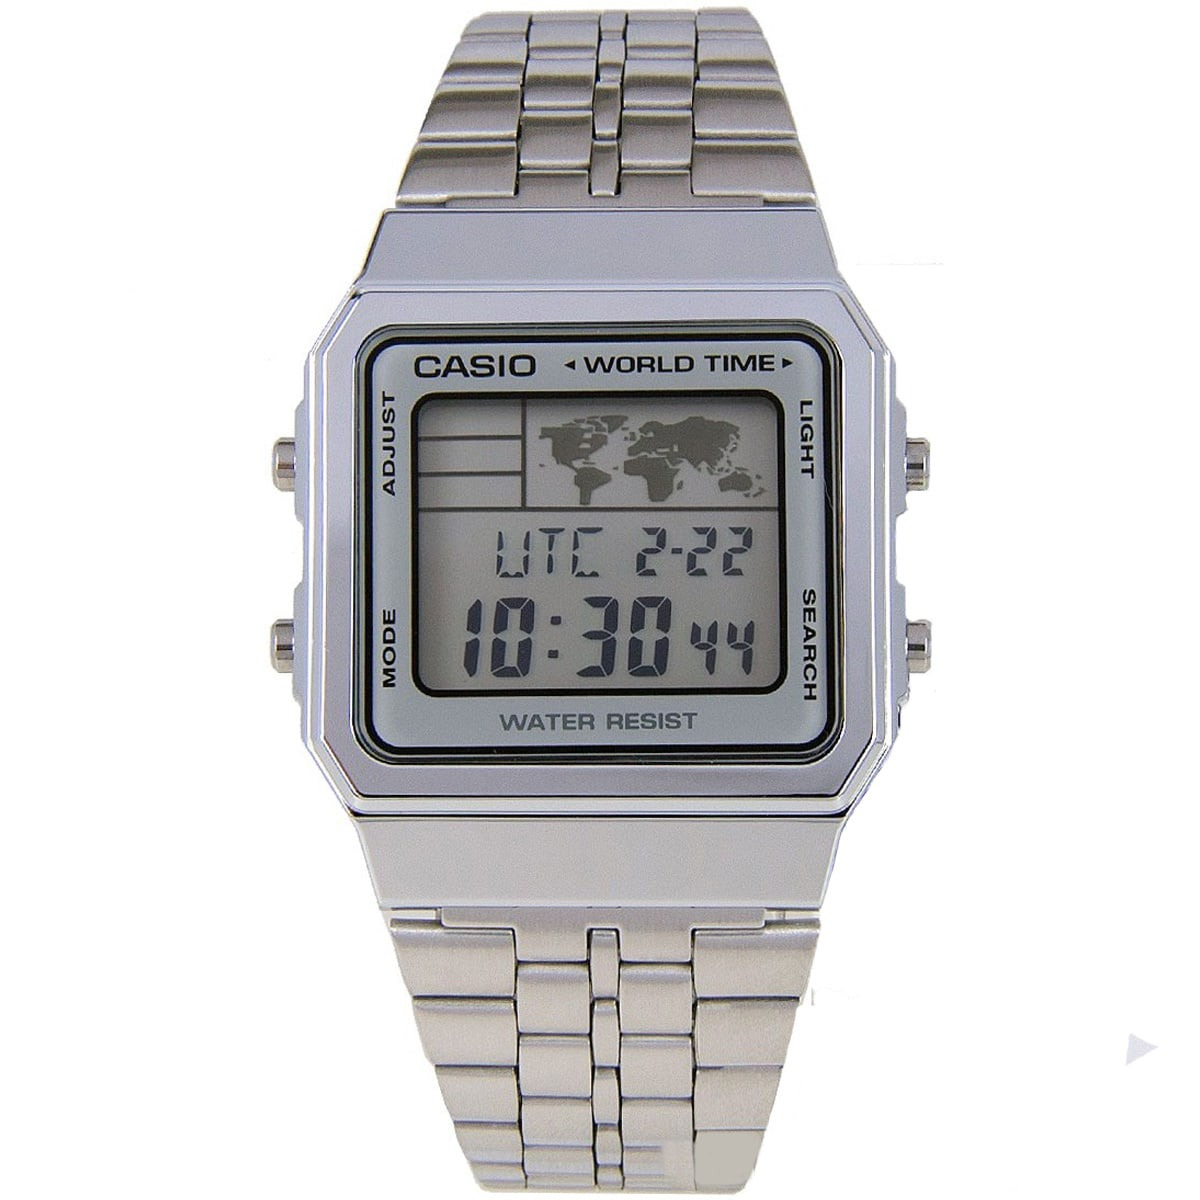 3f6919eadd0 Relógio Casio Vintage Unisex A500wa-7df